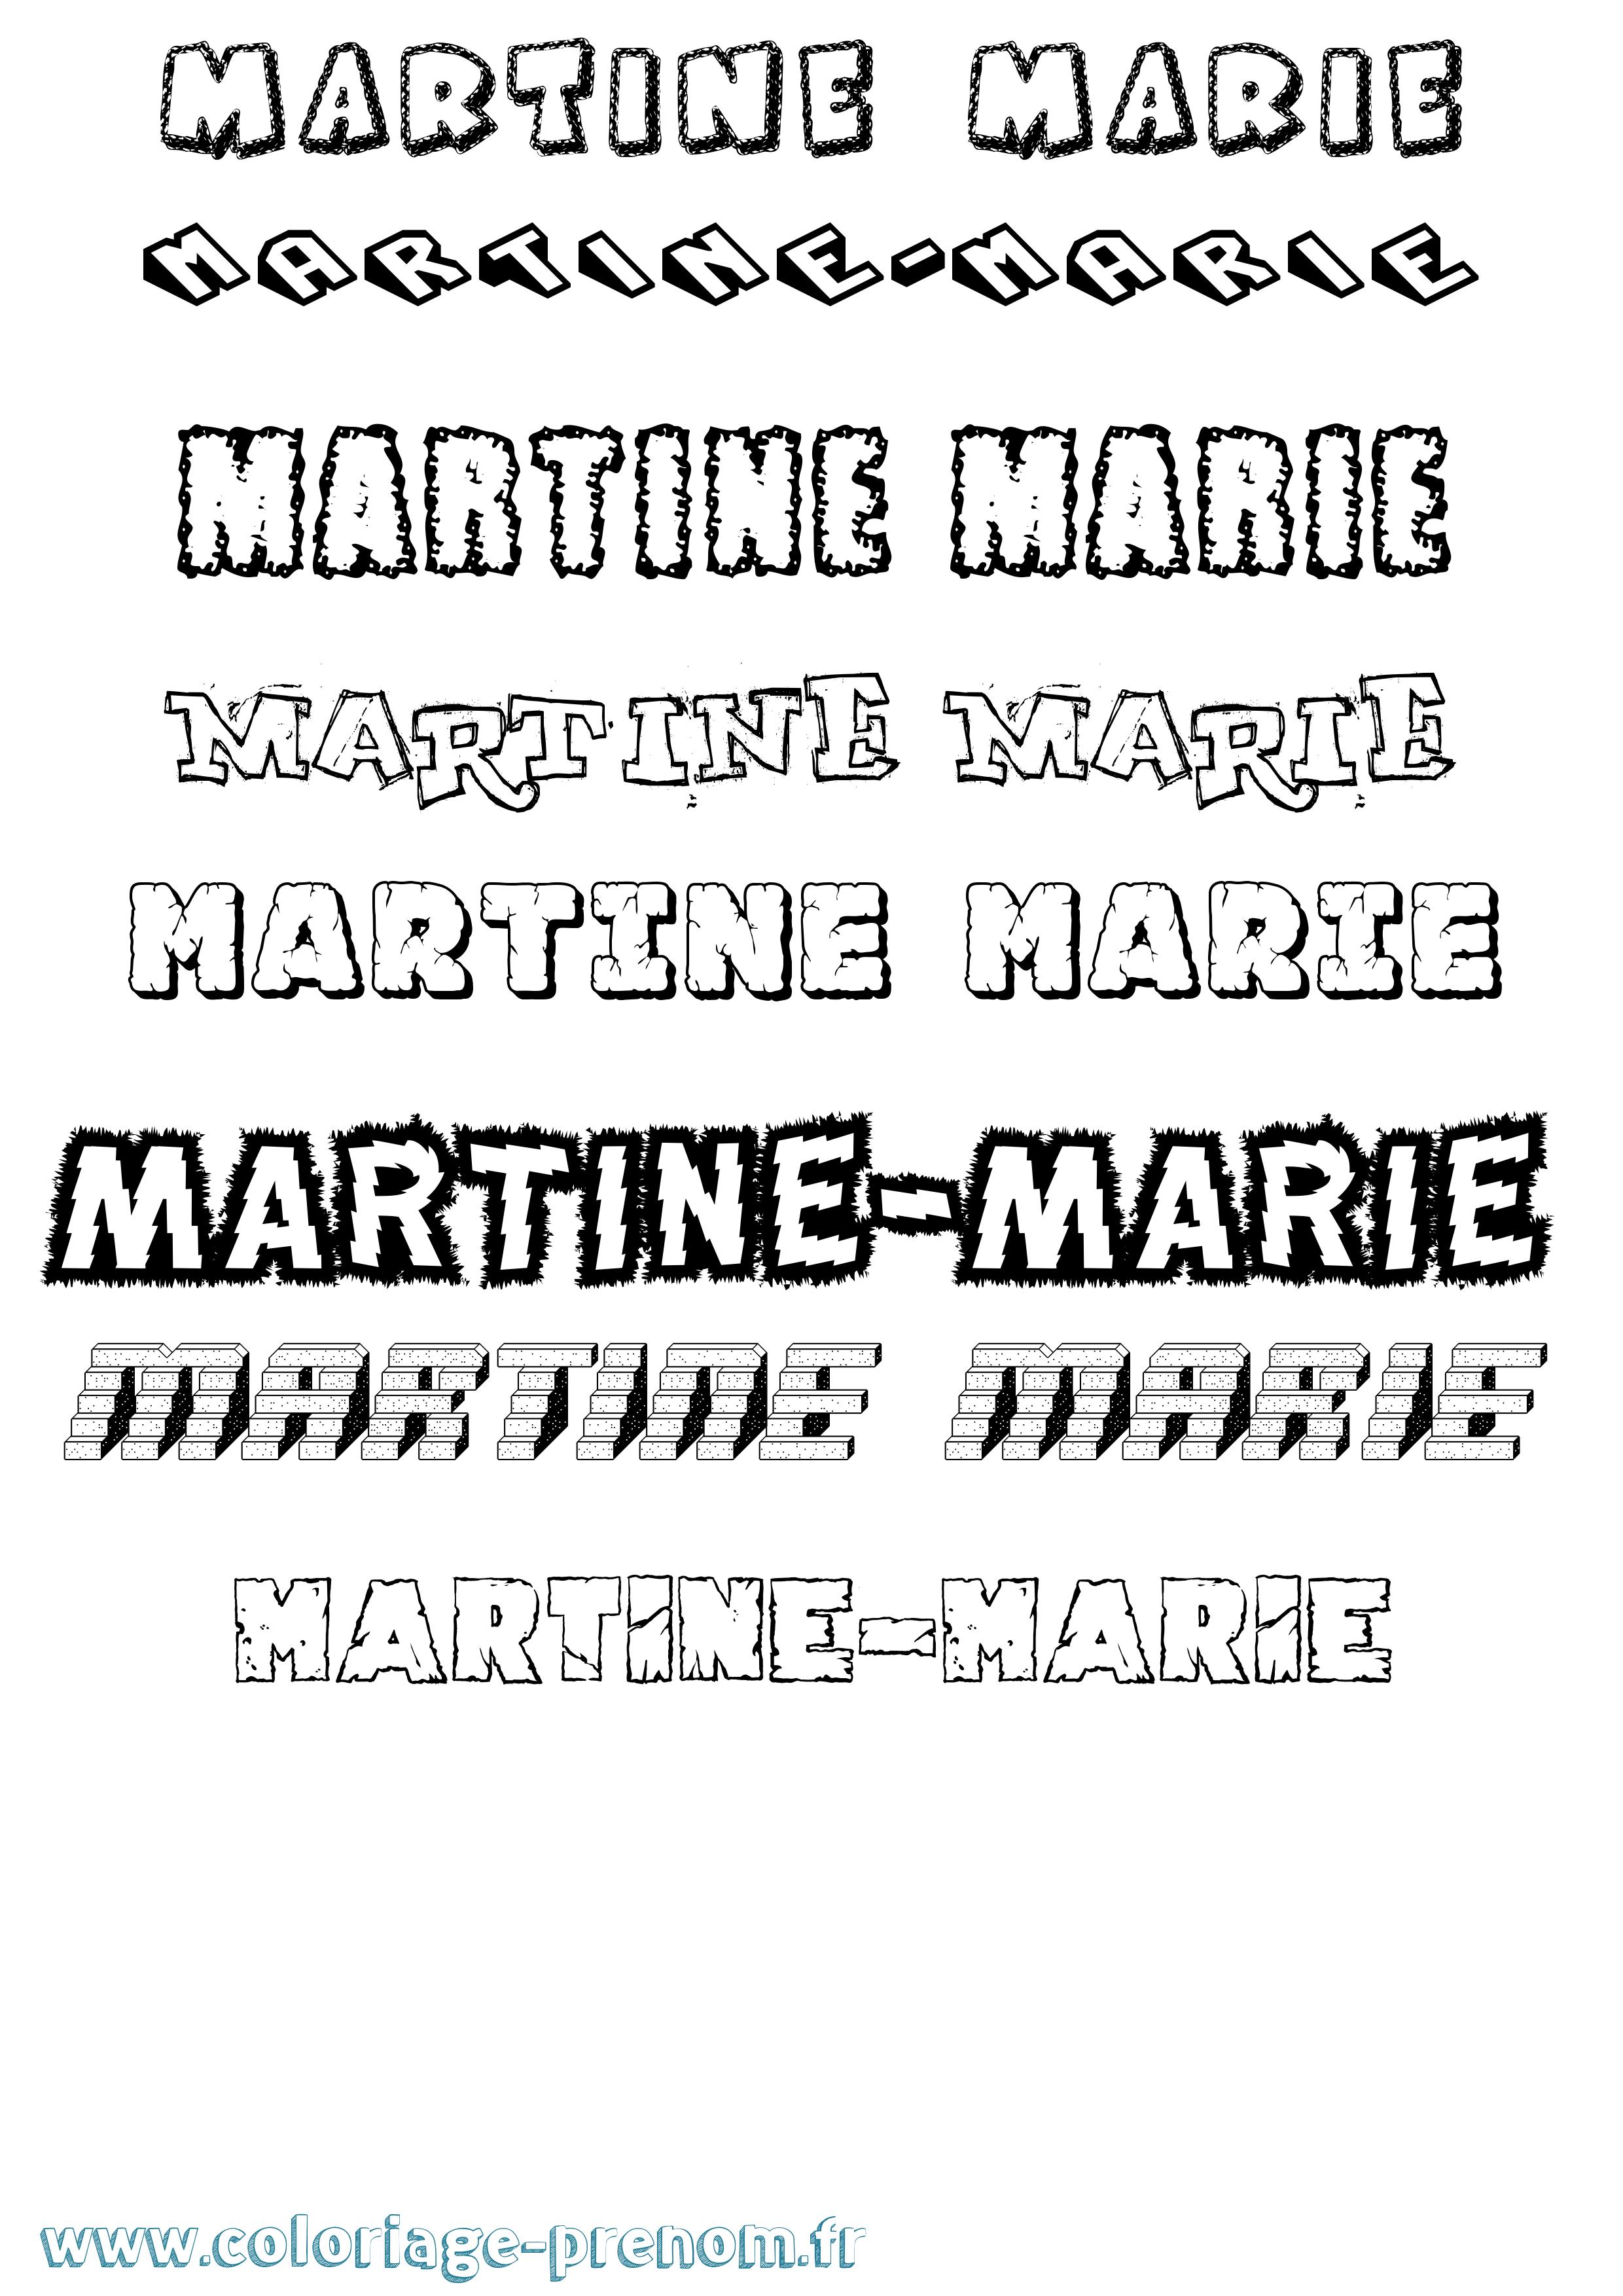 Coloriage du prénom Martine-marie : à Imprimer ou ...